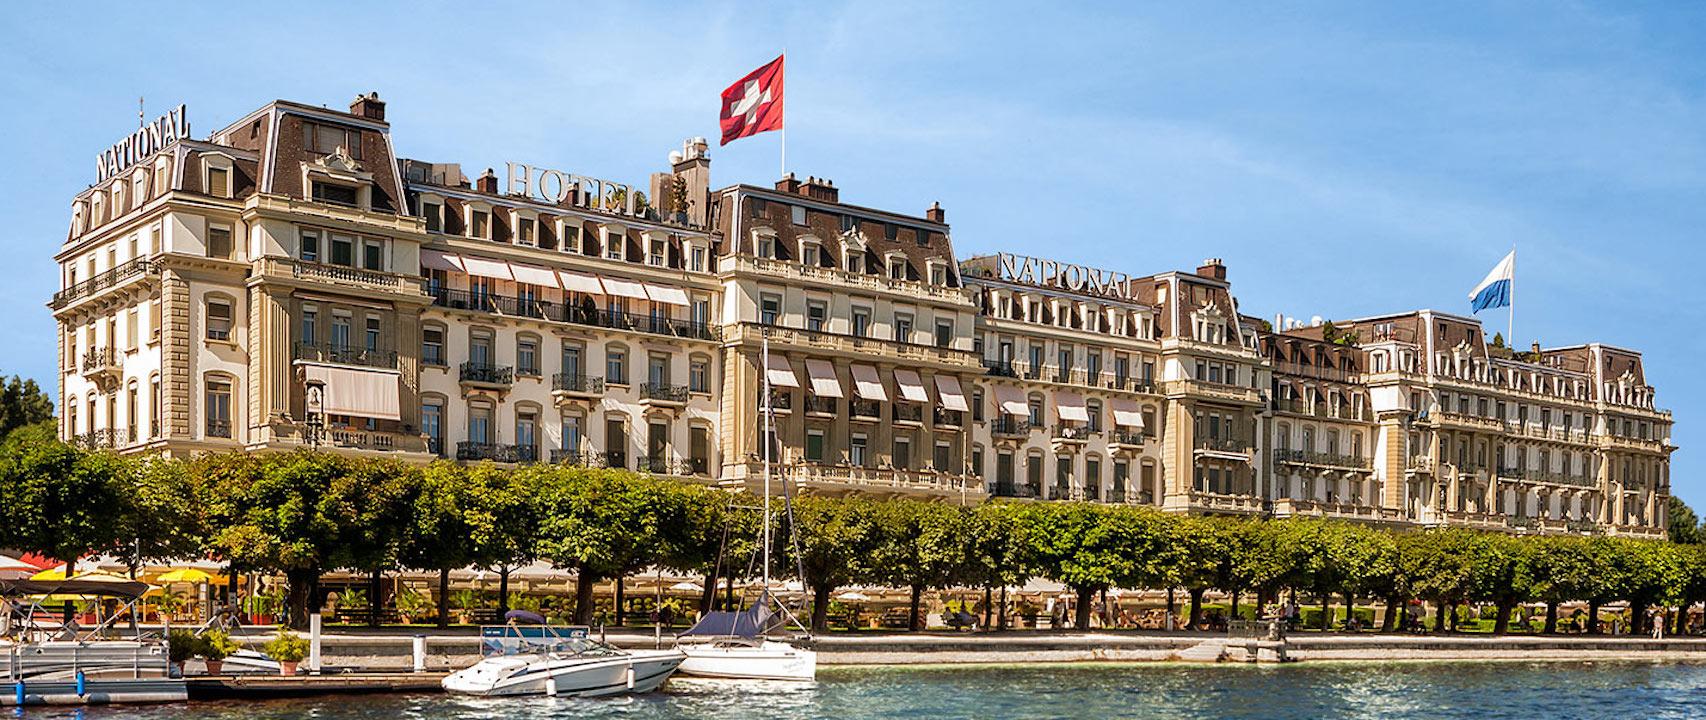 Grand Hotel National , Lucerne / Switzerland